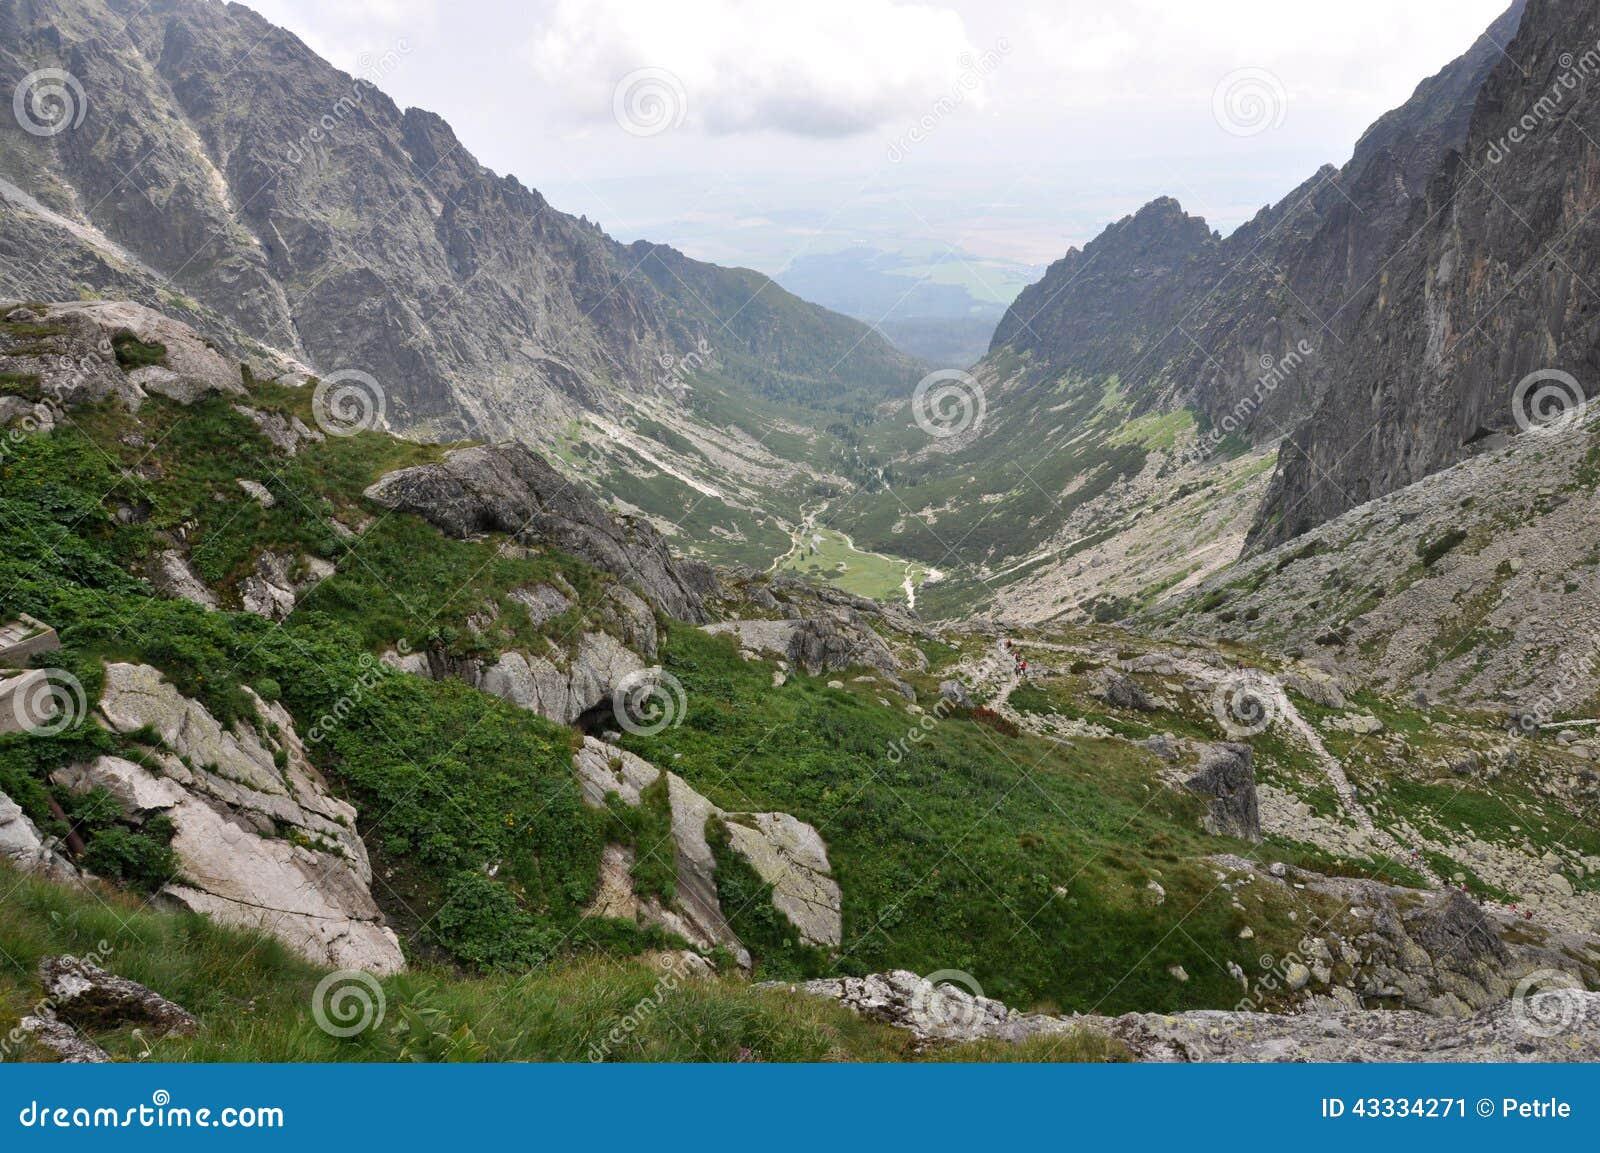 Montagnes et vall es du haut tatras slovaquie l 39 europe for Europeanhome com